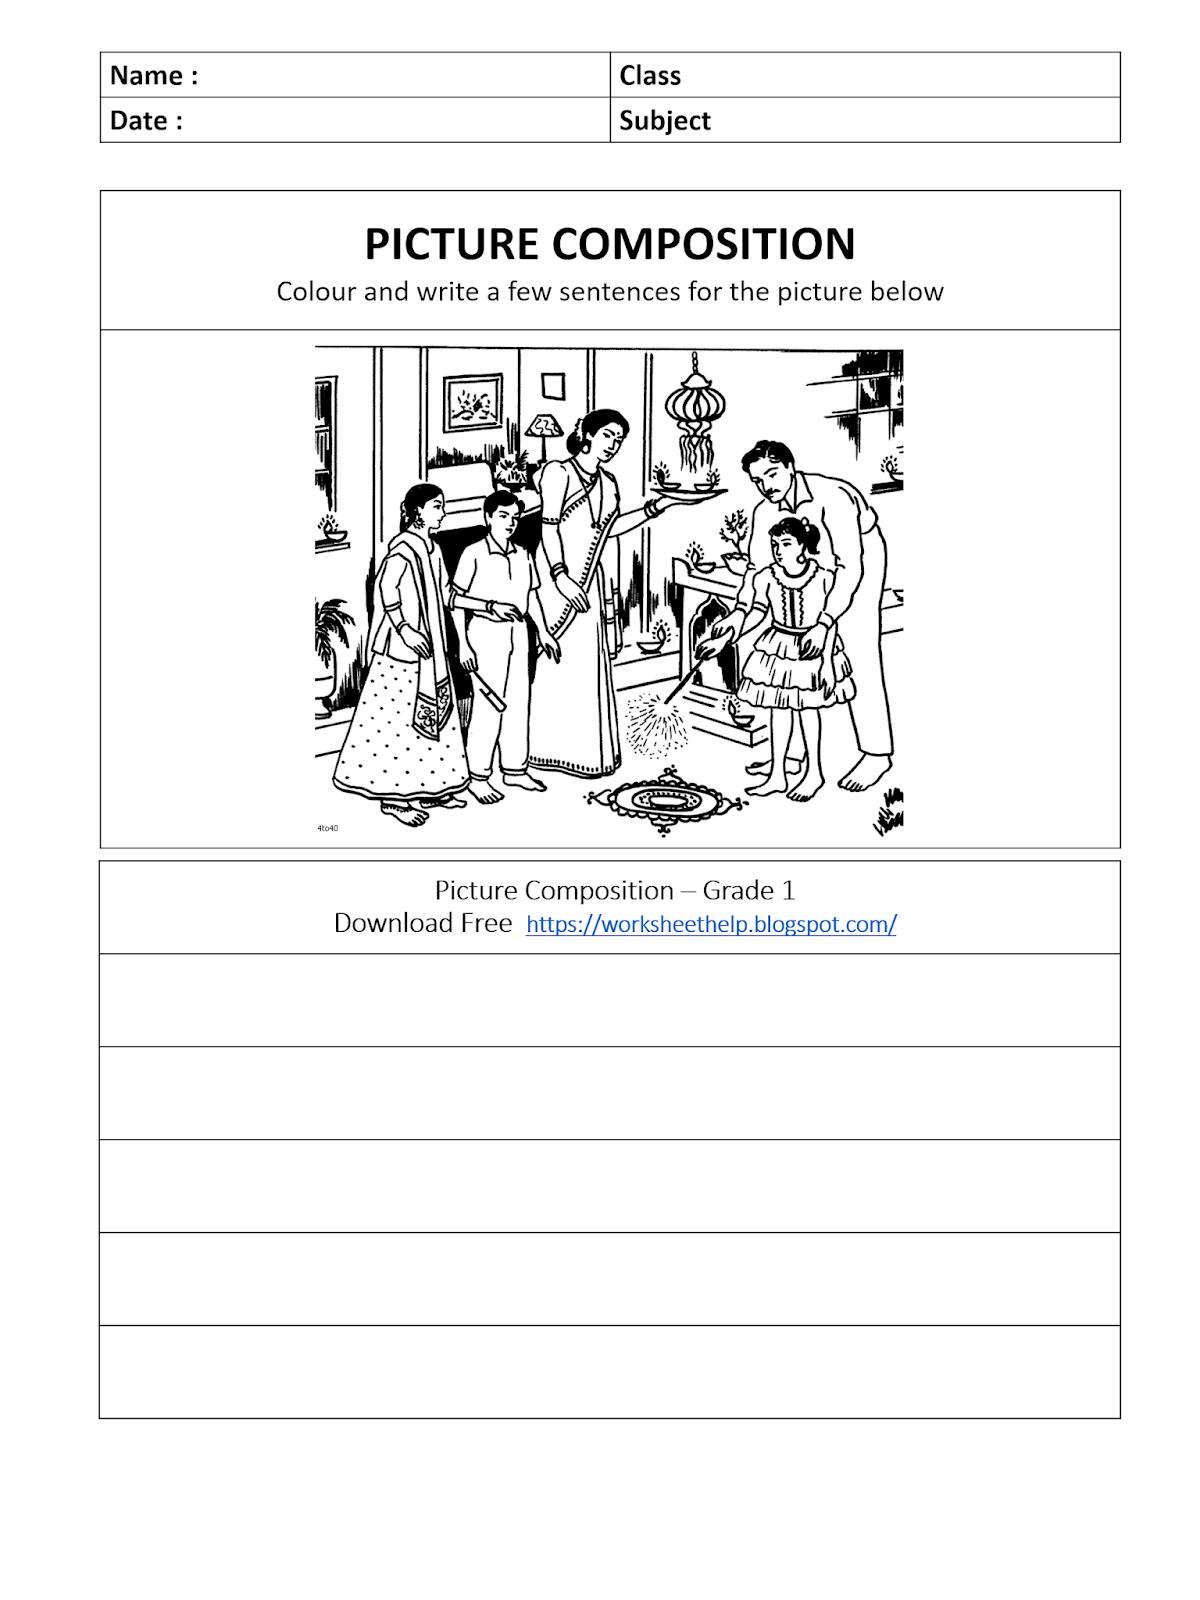 Picture Composition Worksheet Grade 1